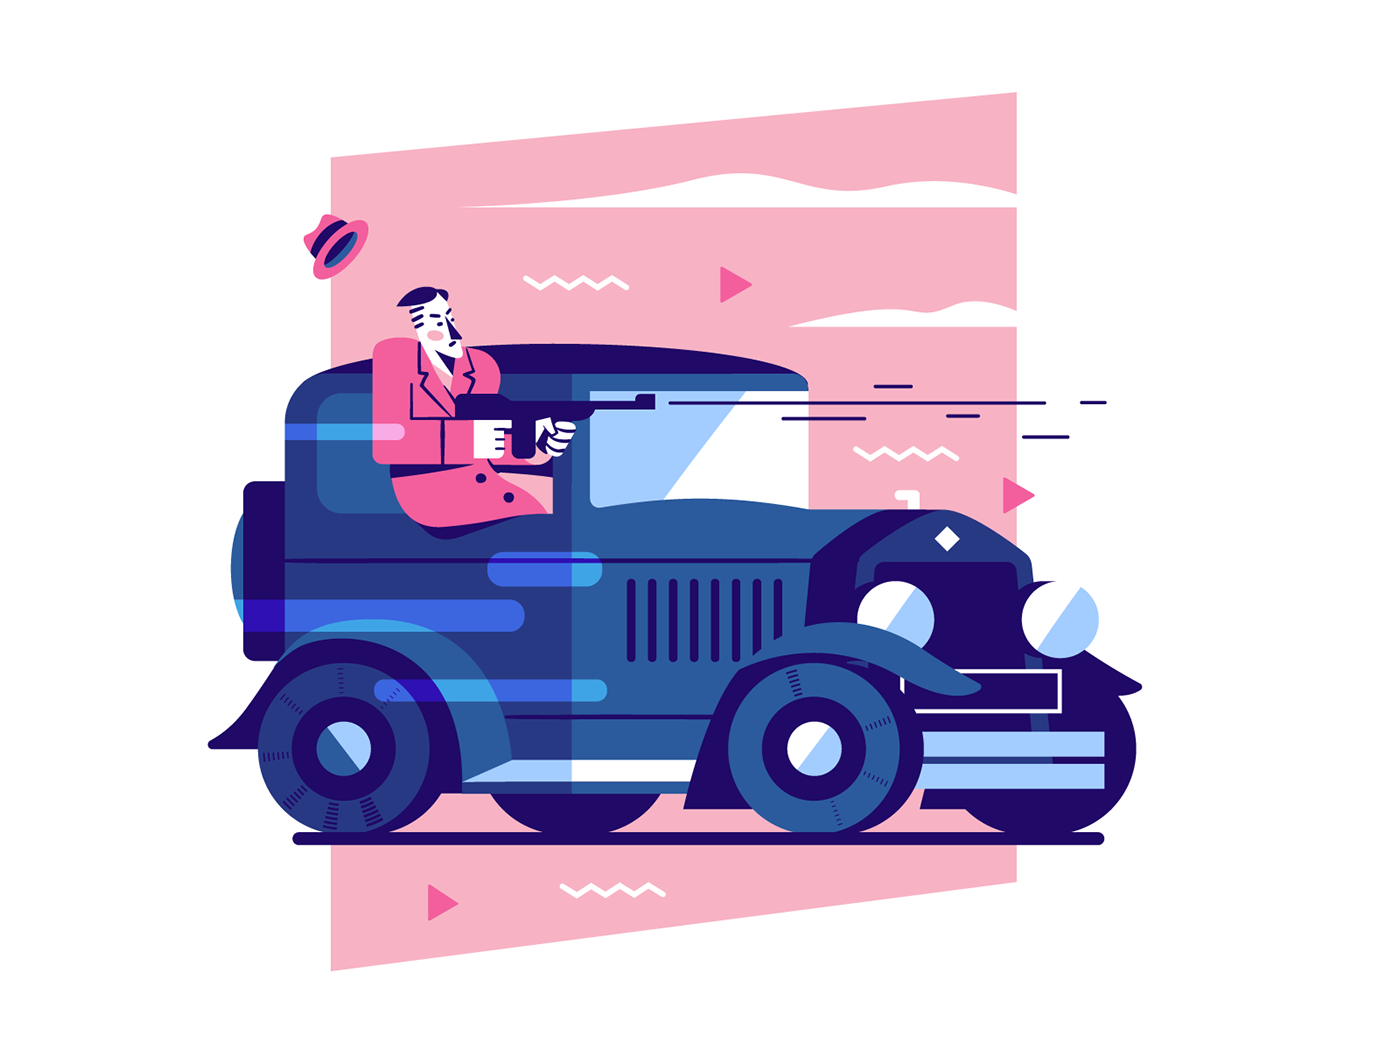 Image may contain: cartoon, land vehicle and vehicle